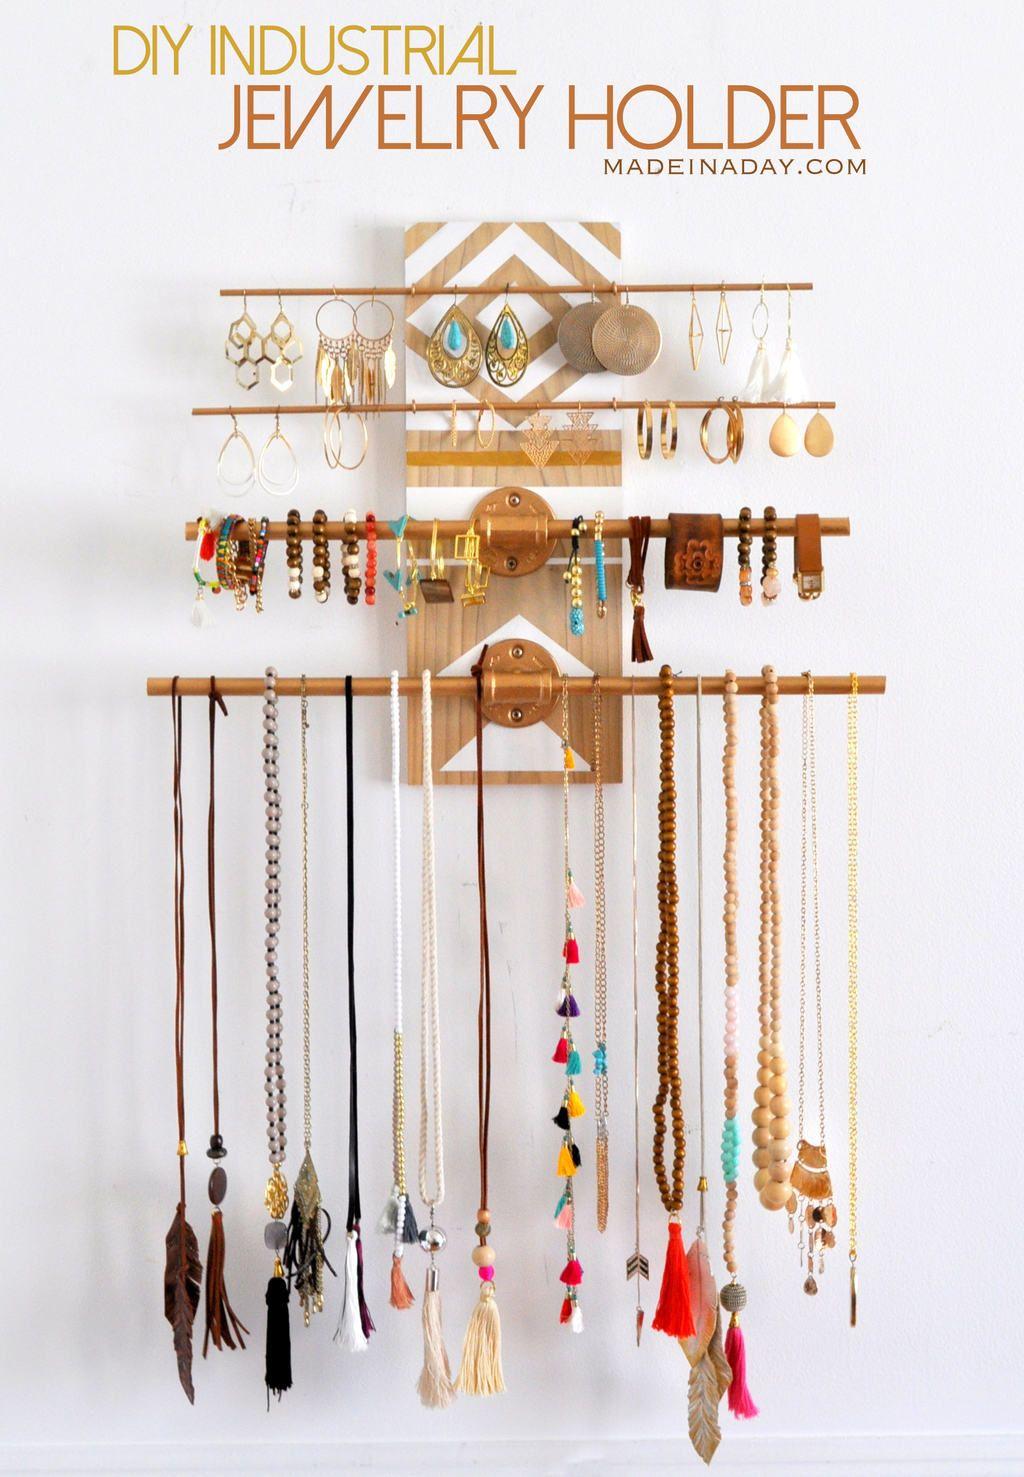 Jewelry Holder Wall Easy Diy Industrial Jewelry Wall Organizer Industriell Smycken